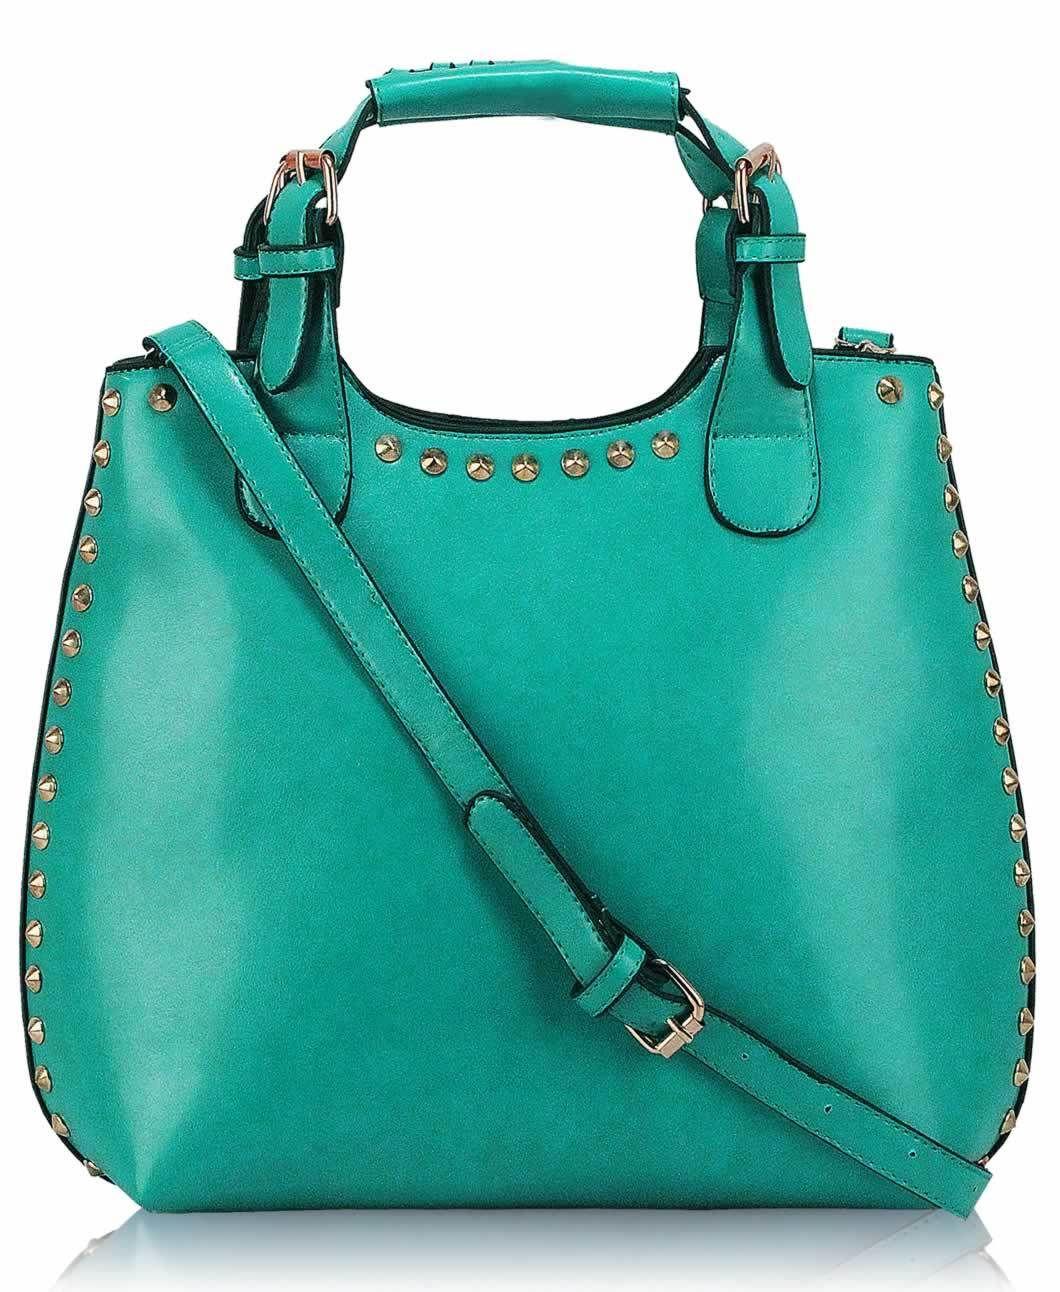 DIY Fashion, Studded Bucket Bag Inspired by Alexander Wang